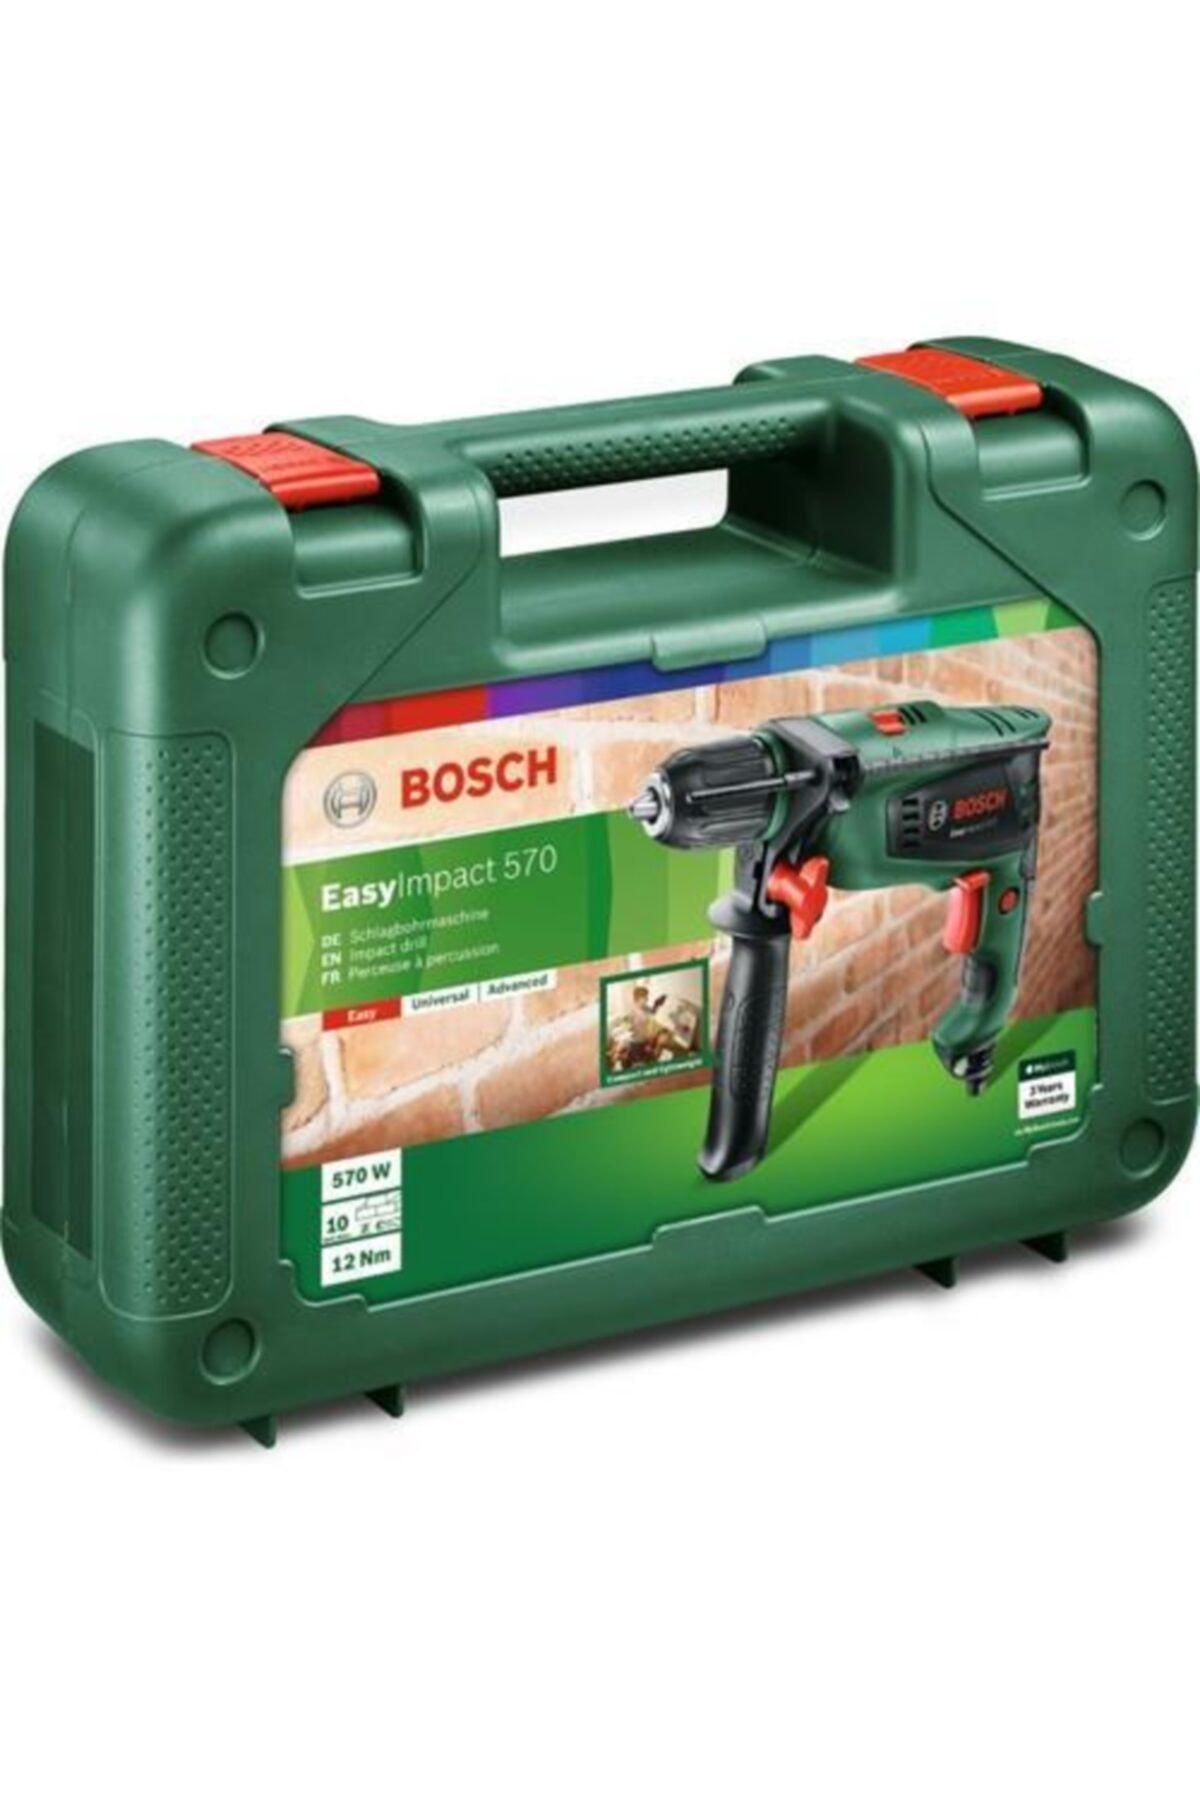 Bosch Easyımpact Darbeli Matkap 570w 2